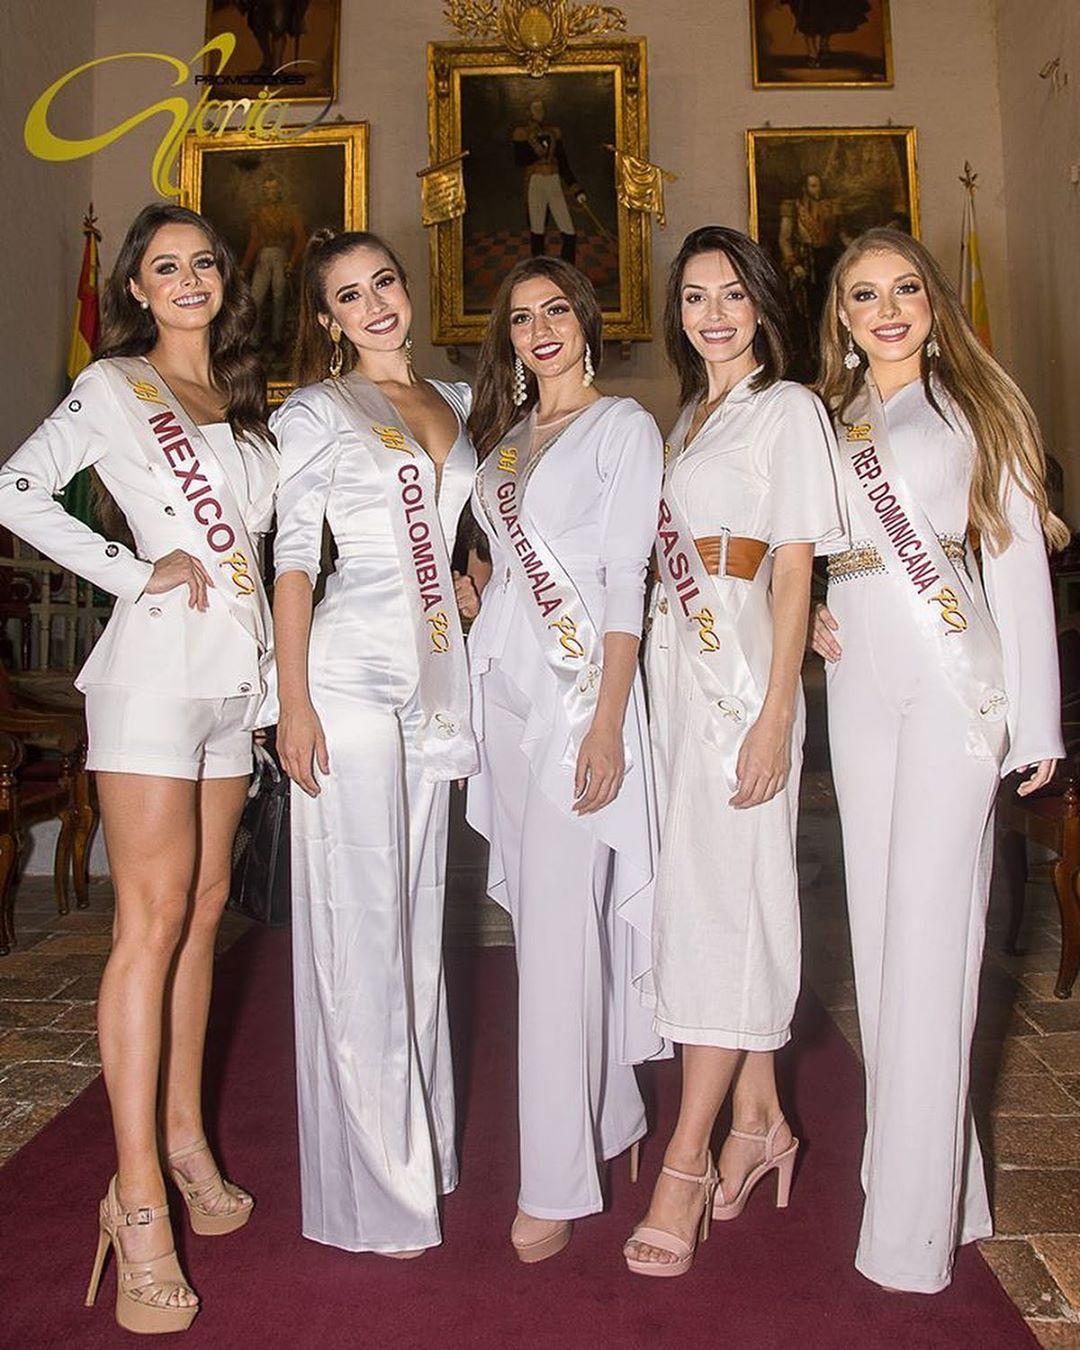 regina peredo, reyna hispanoamericana 2019. - Página 6 84280110